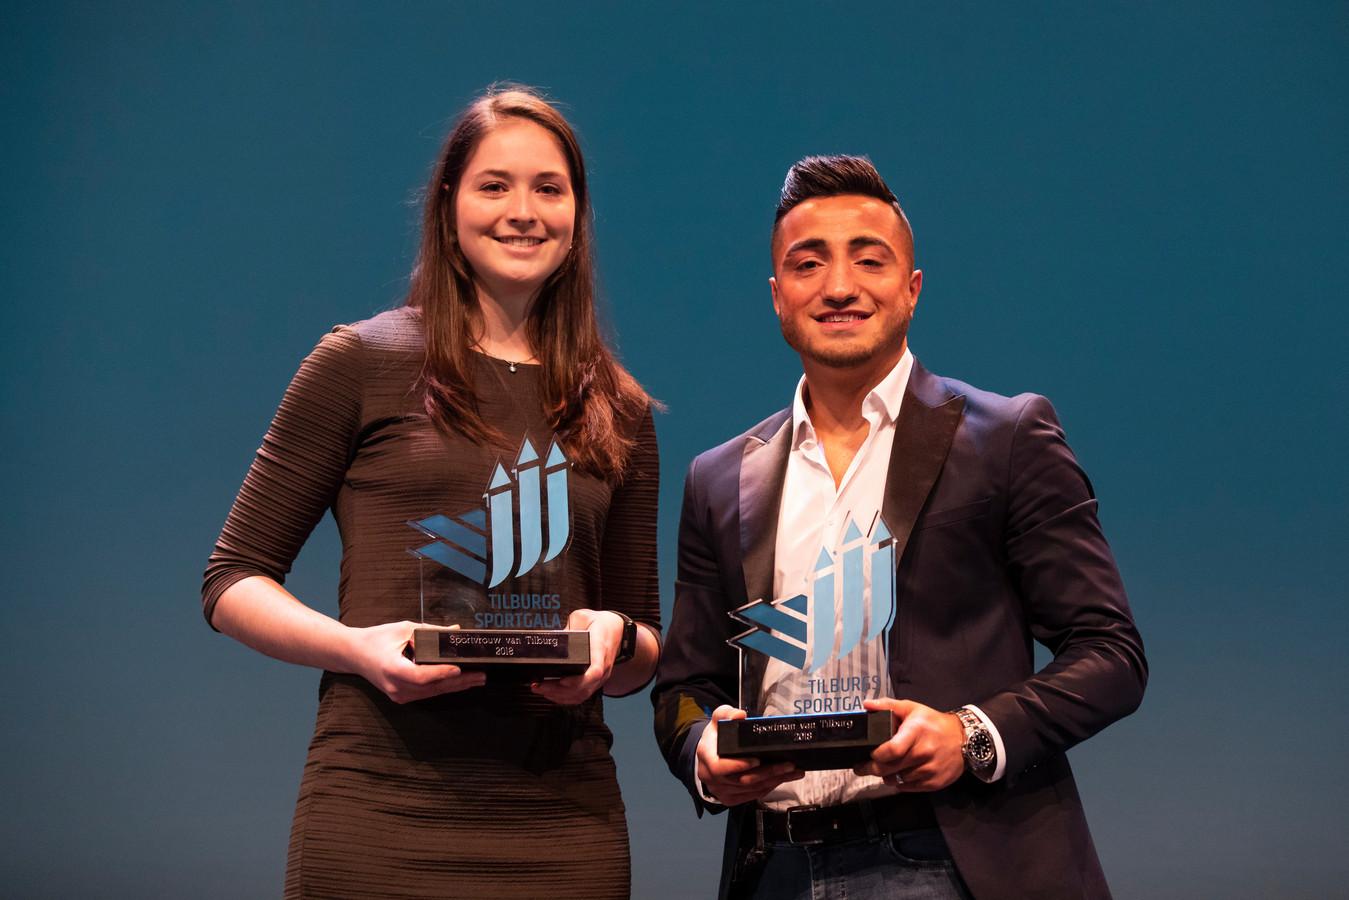 Tanita Hofmans en Tayfun Özcan, Sportvrouw en Sportman van Tilburg in 2018.